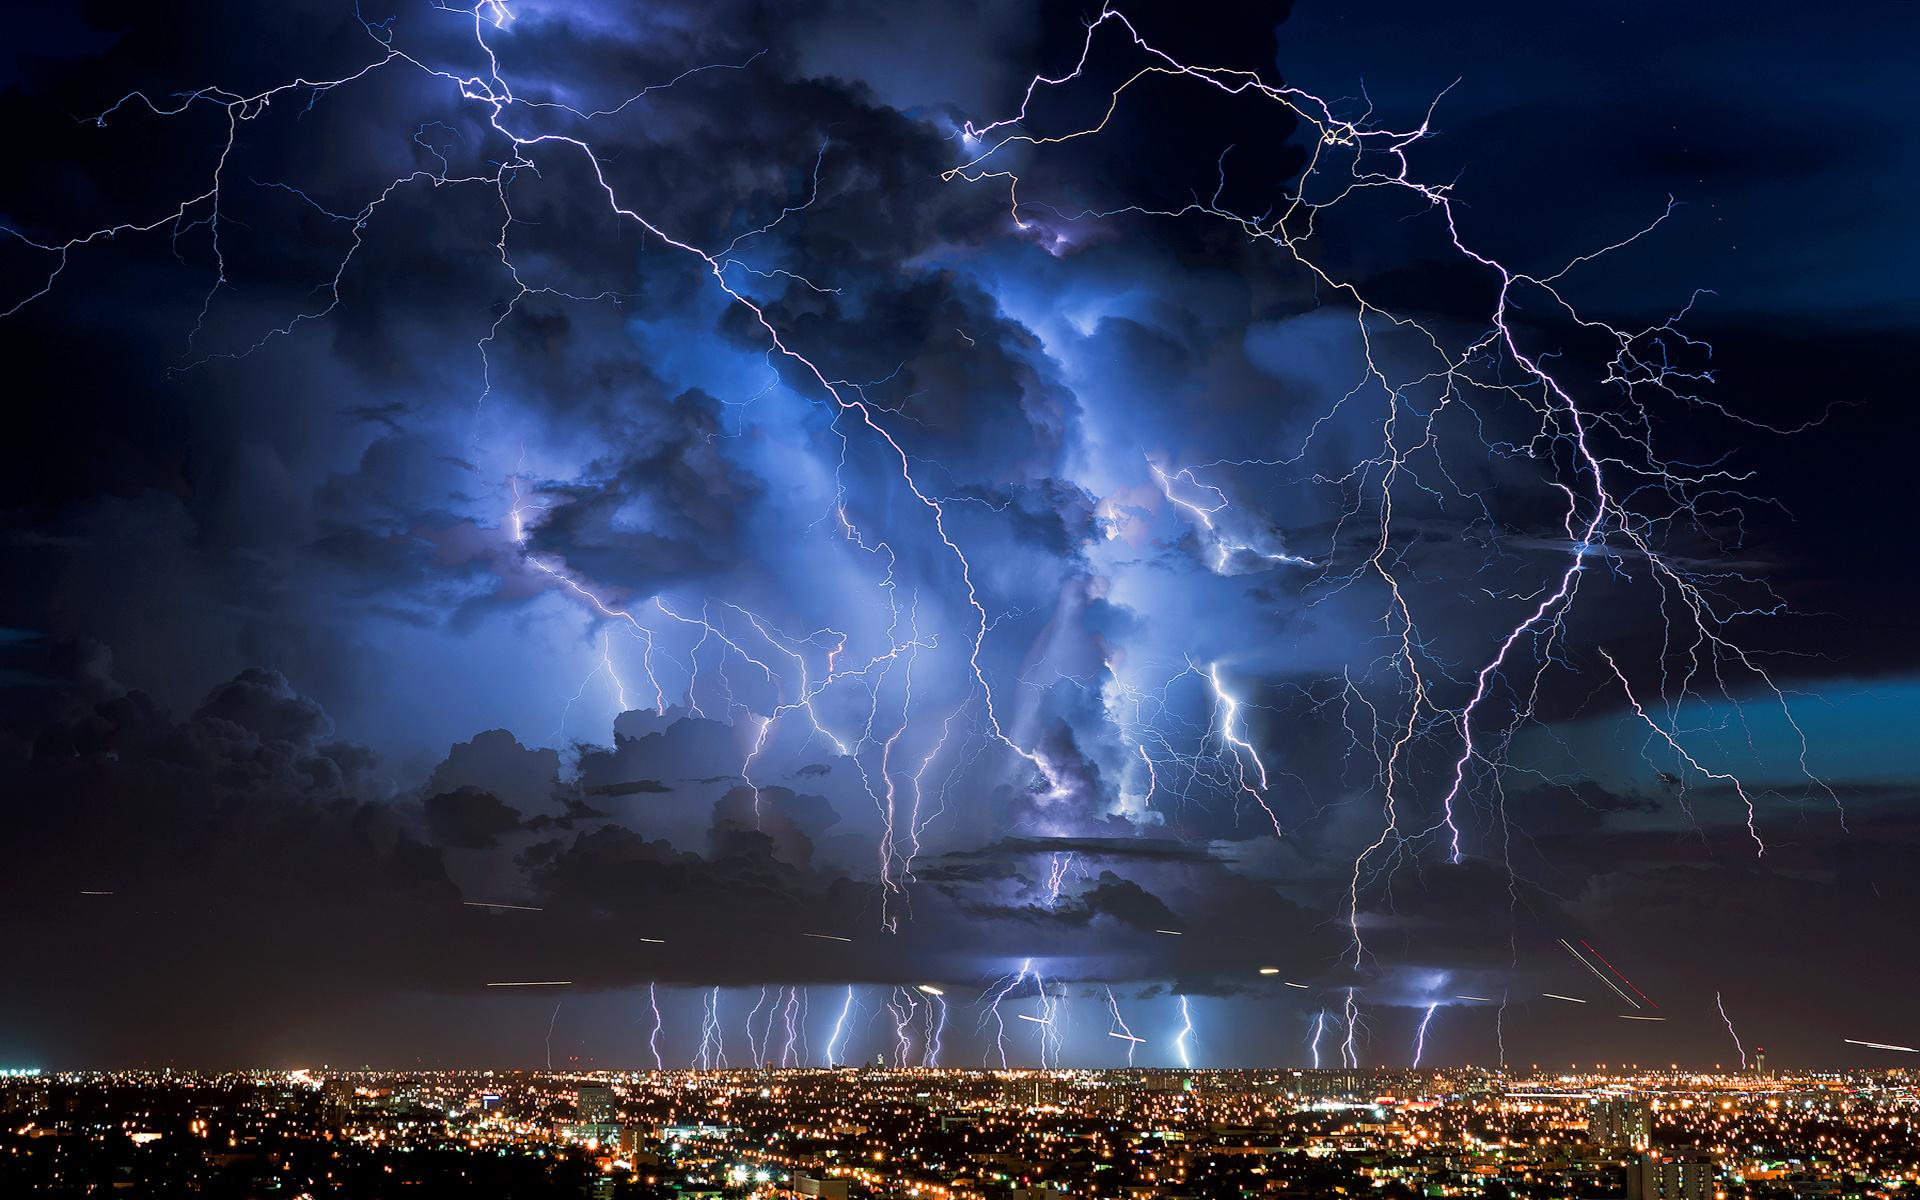 Prochain orage sur le ciel de Tunisie !